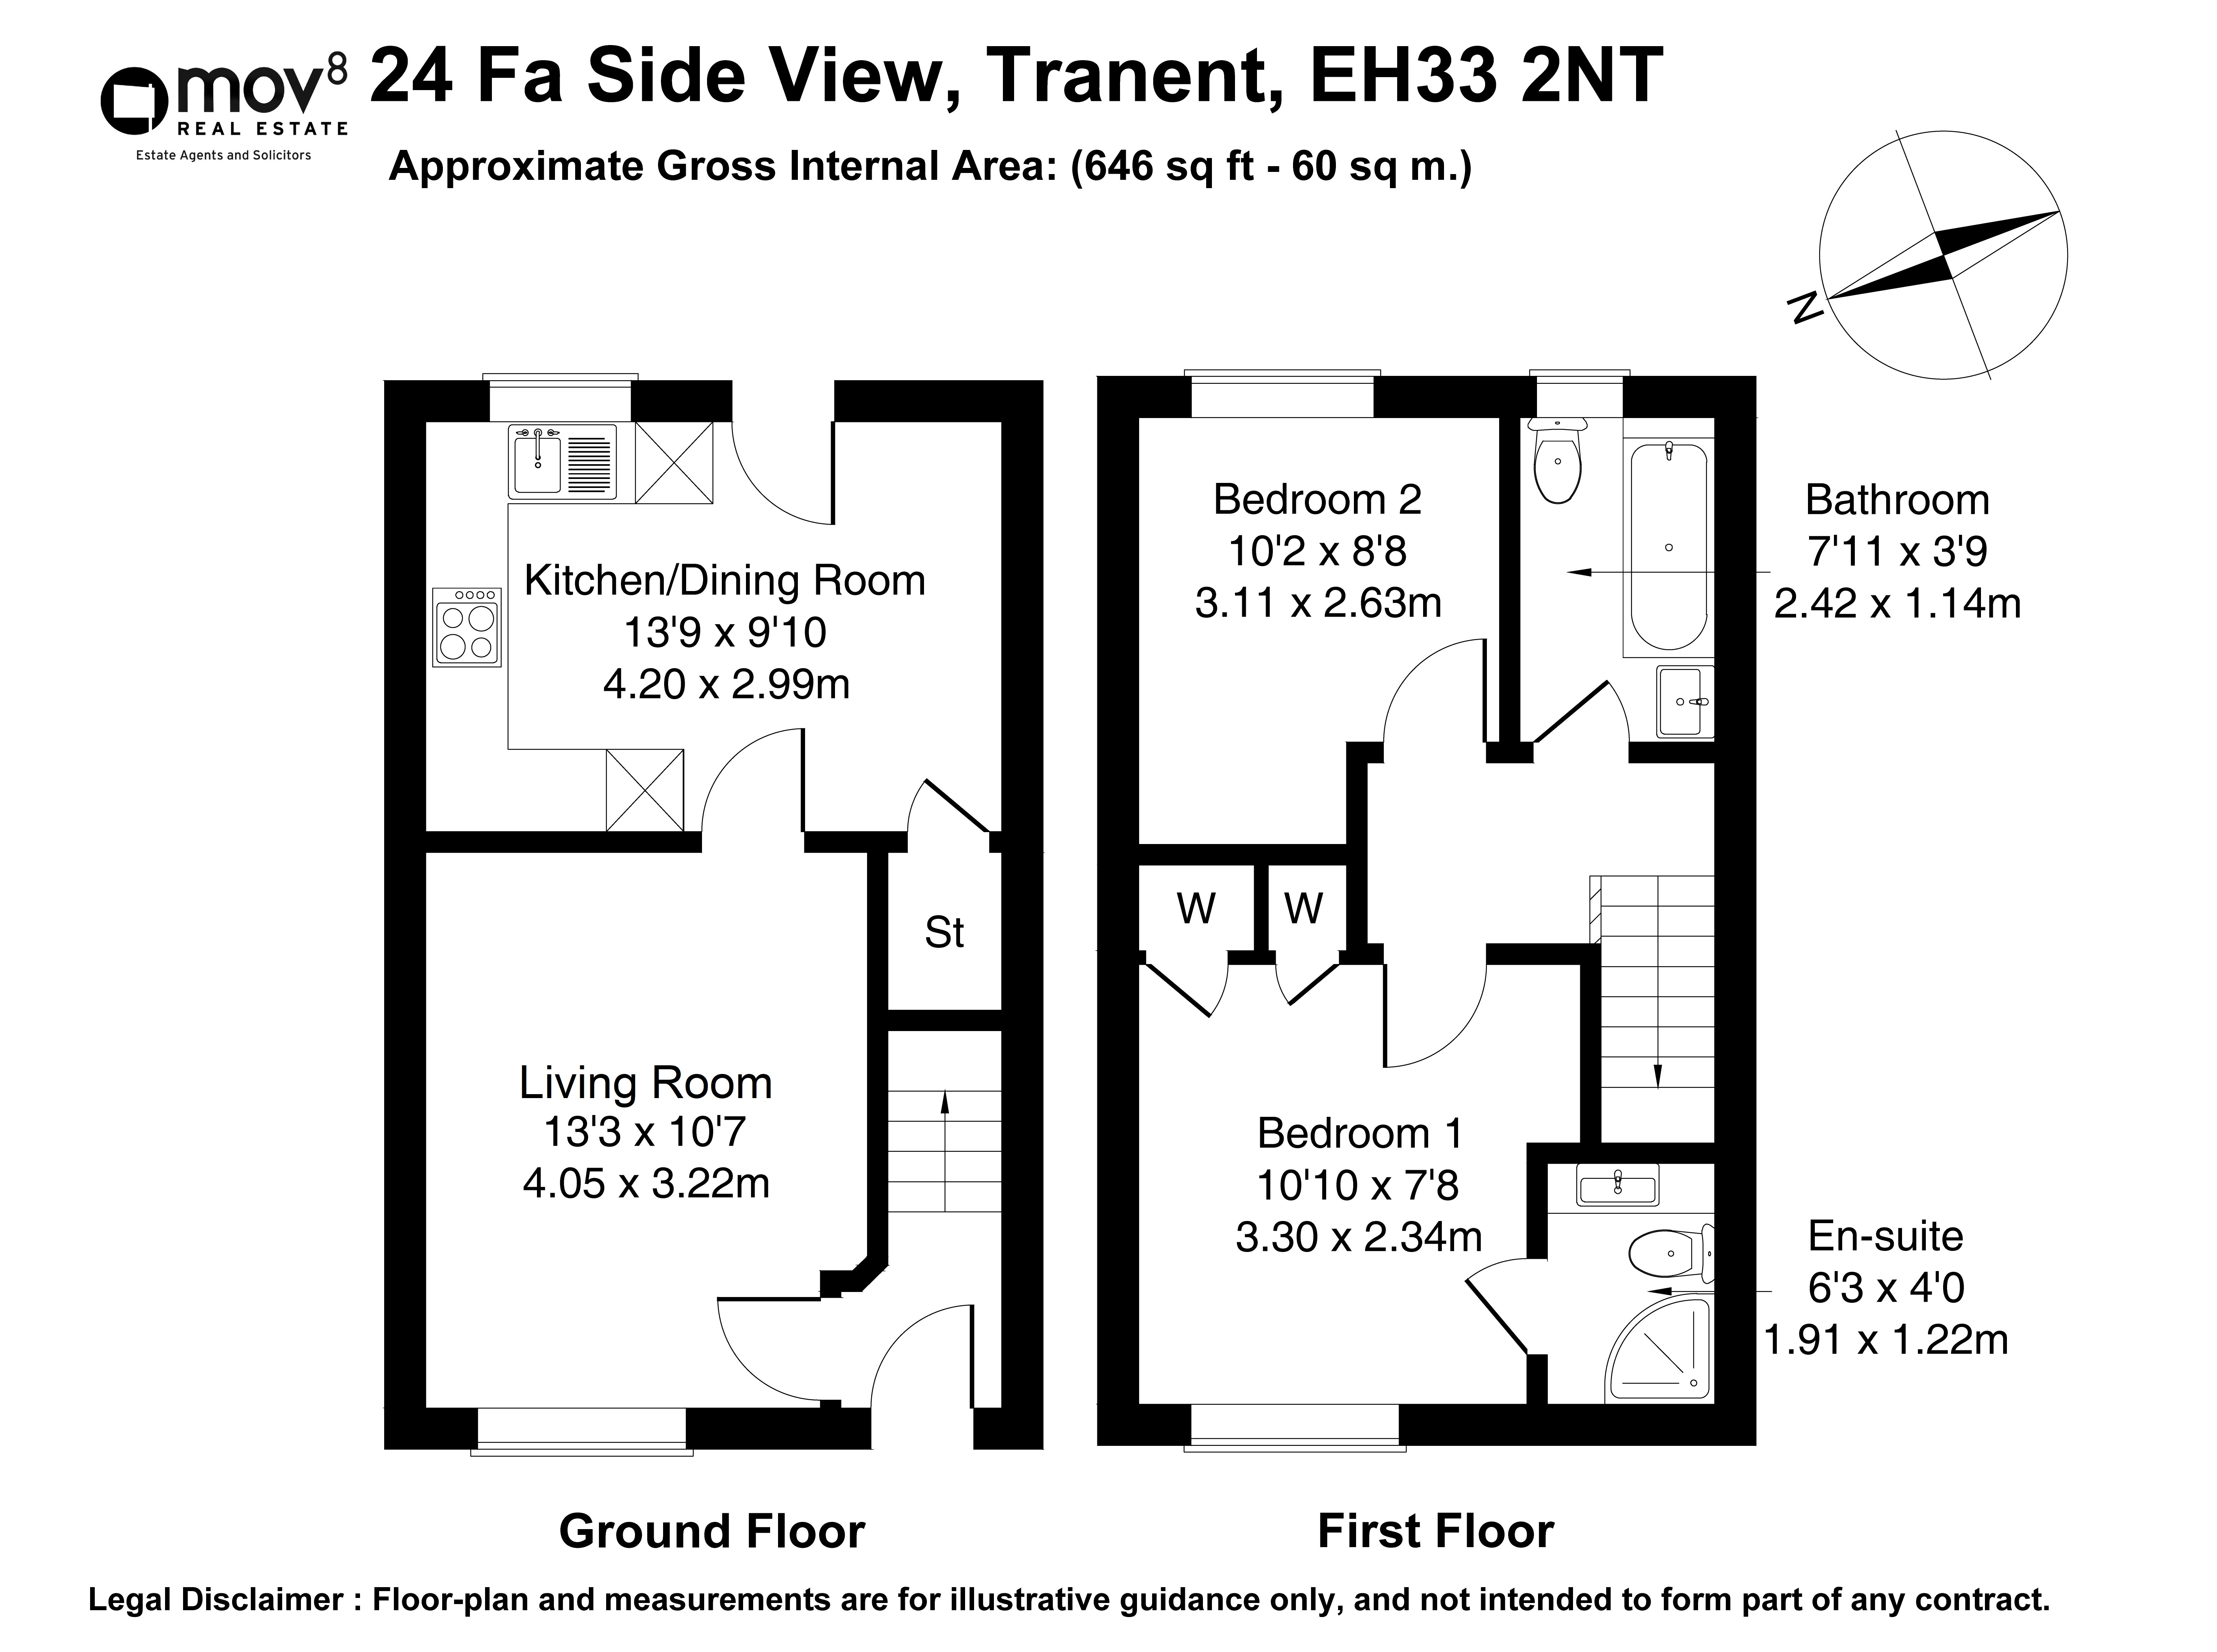 Floorplan 1 of 24 Fa'side View, Tranent, East Lothian, EH33 2NT